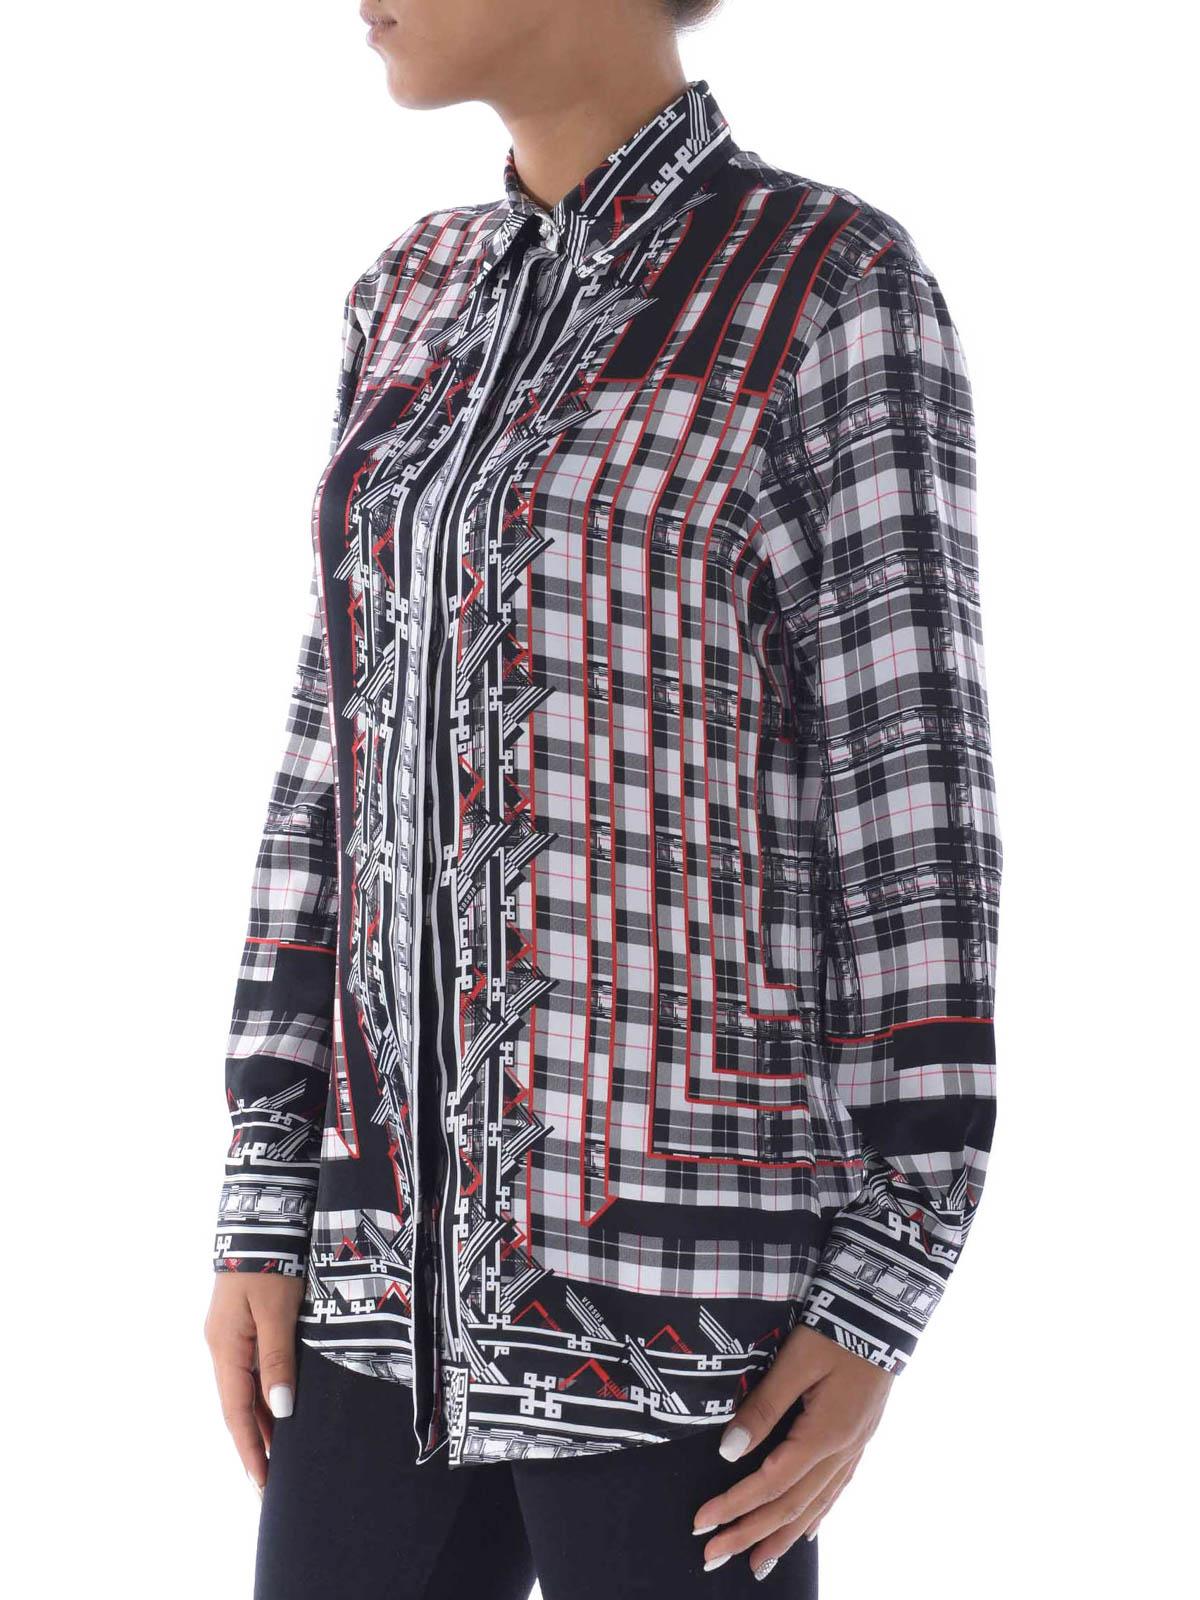 d4d853df606f Versus Versace - Fantasy print shirt - shirts - BD20035 BT20660 B7032